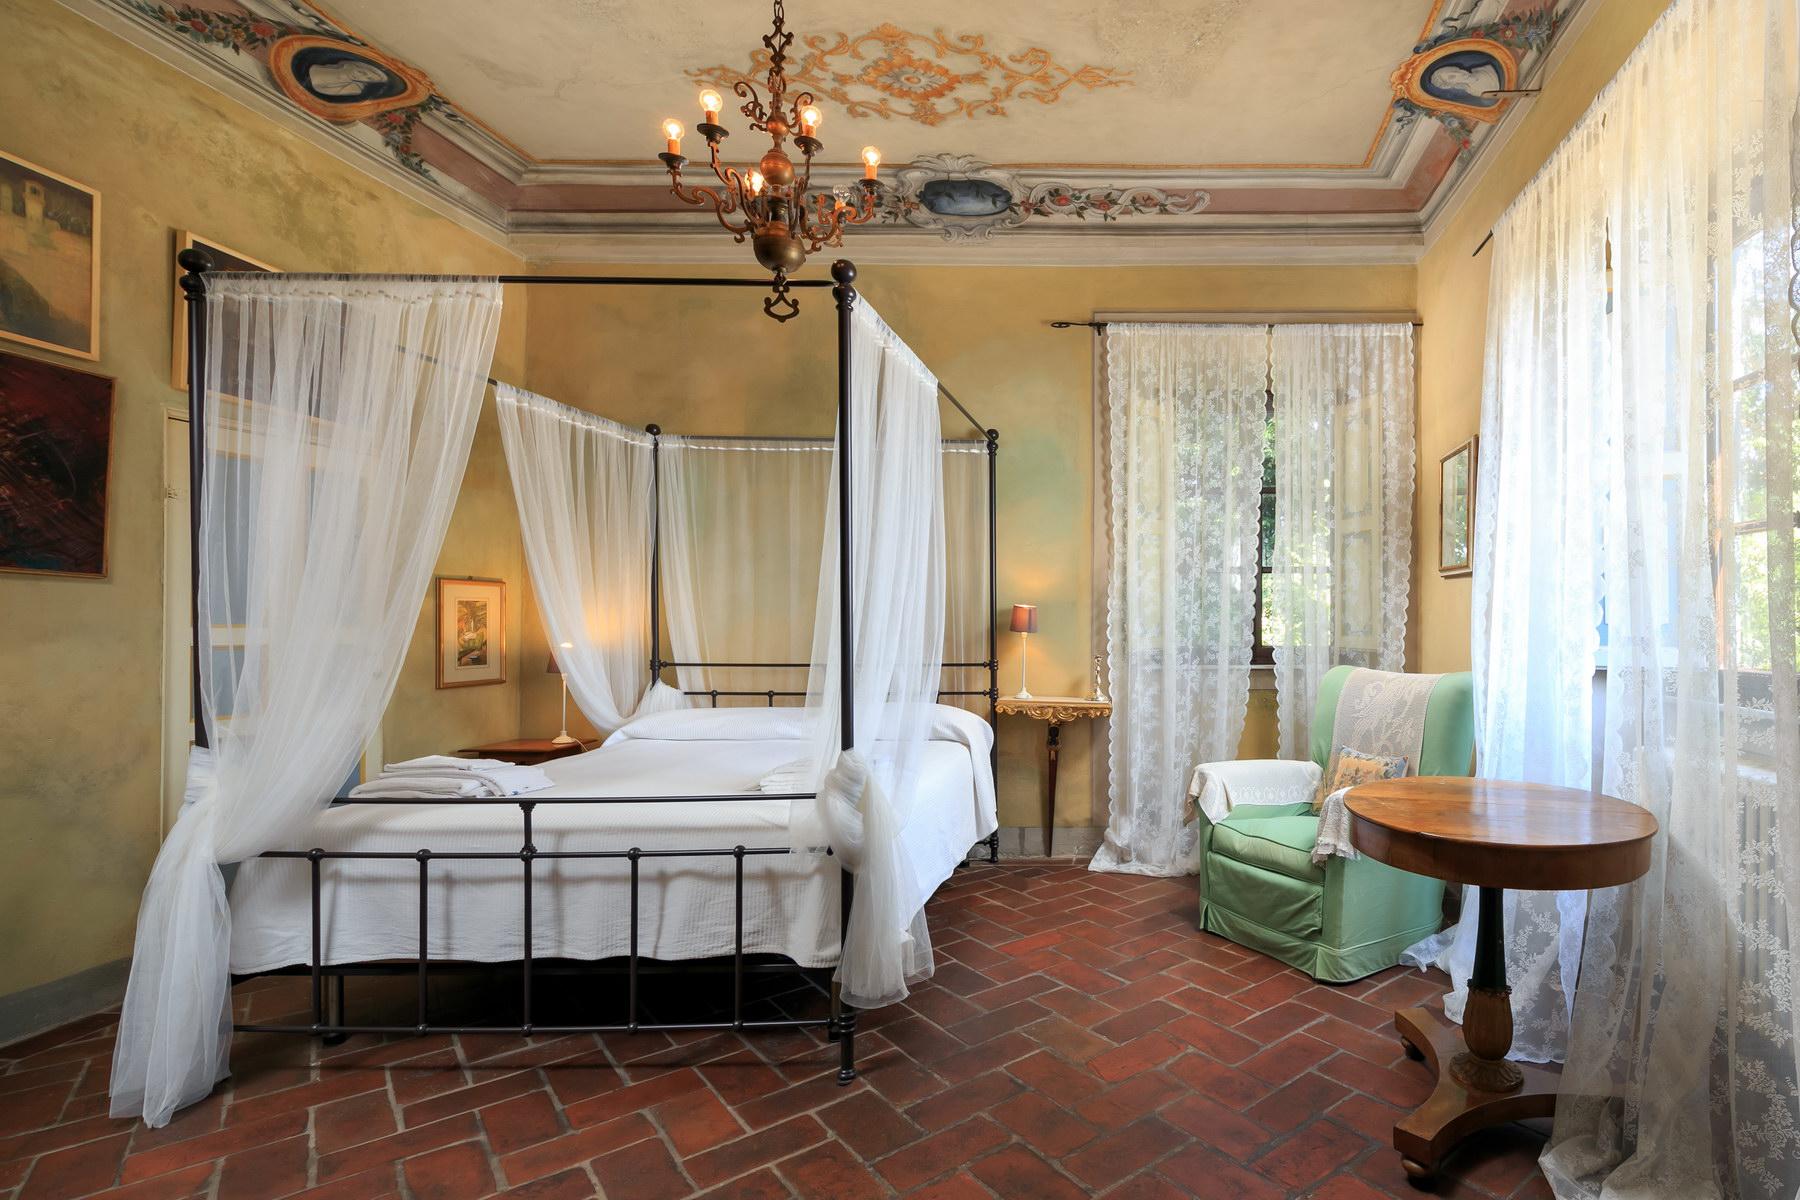 Villa in Vendita a Capannori: 5 locali, 570 mq - Foto 19